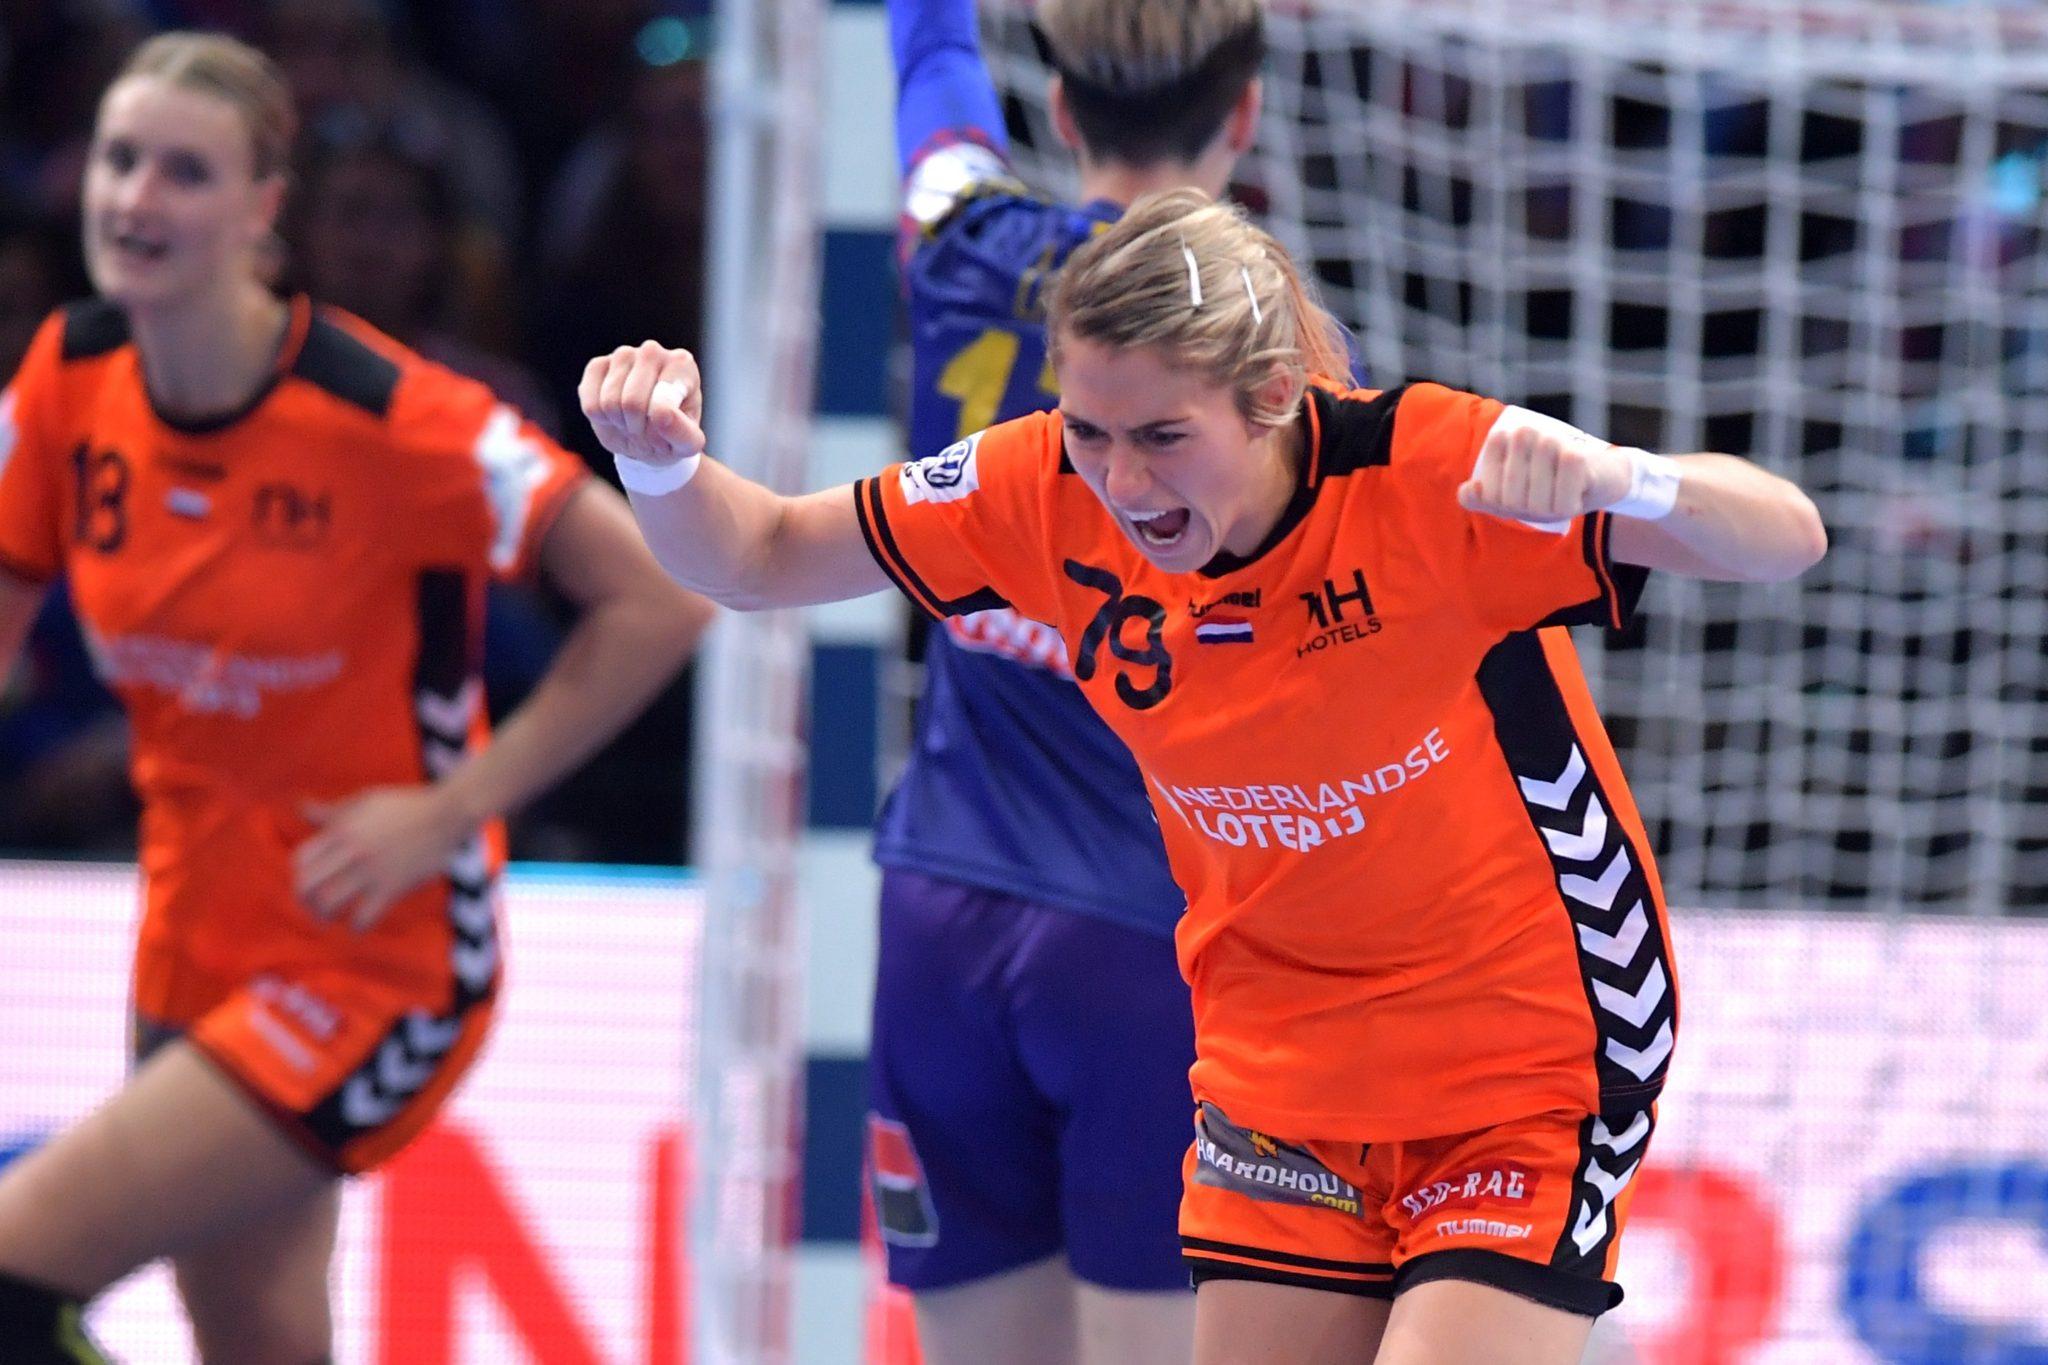 16-12-2018: Handbal: Vrouwen Nederland V Roemenie: Parijs EK Handbal In Frankrijk, 3/4 Plaats Nederland-Roemenie 24-20 Nederland Wint De Bronzen Medaille Estavana Polman #79 NED Juicht